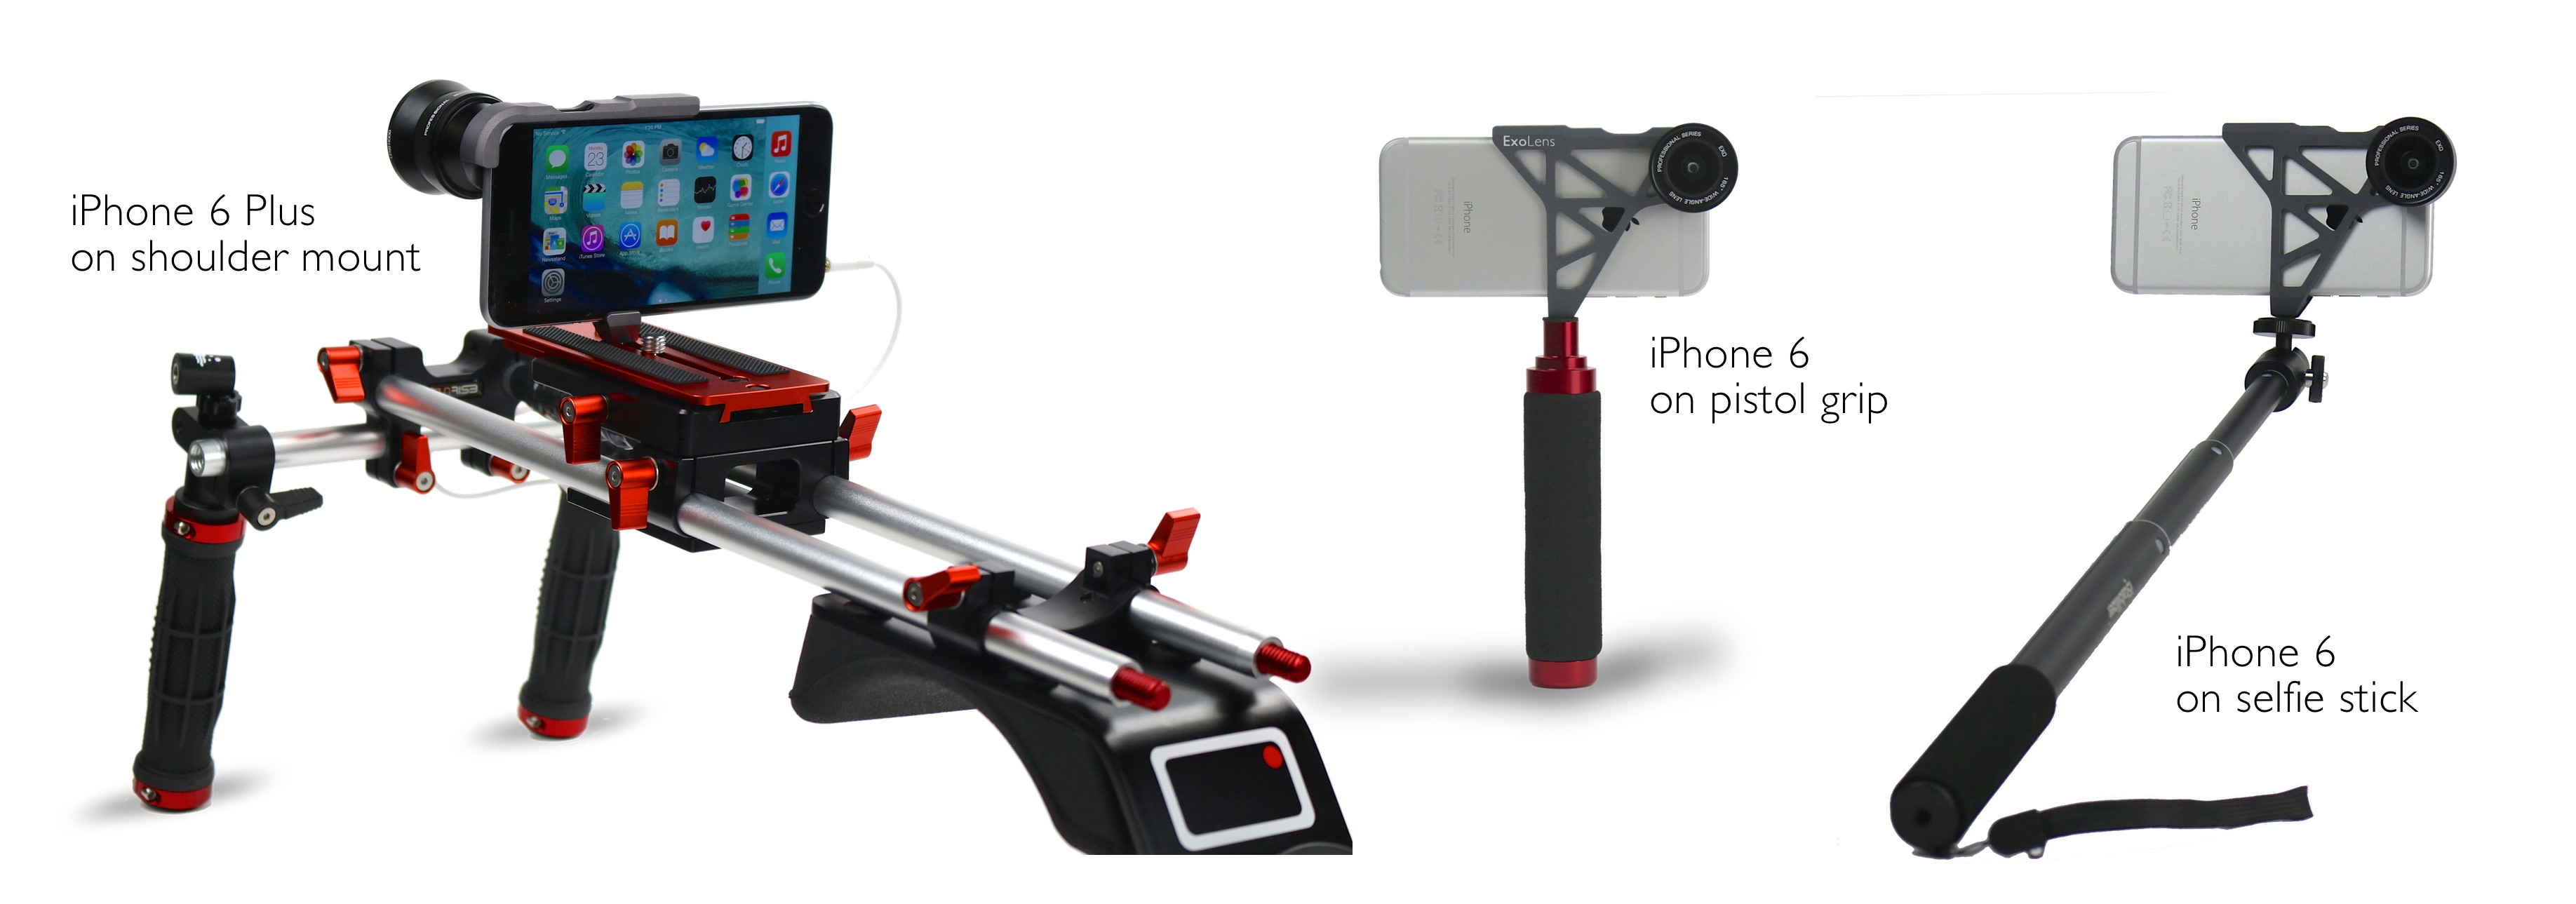 shoulder_mount_pistol_grip_selfie_stick